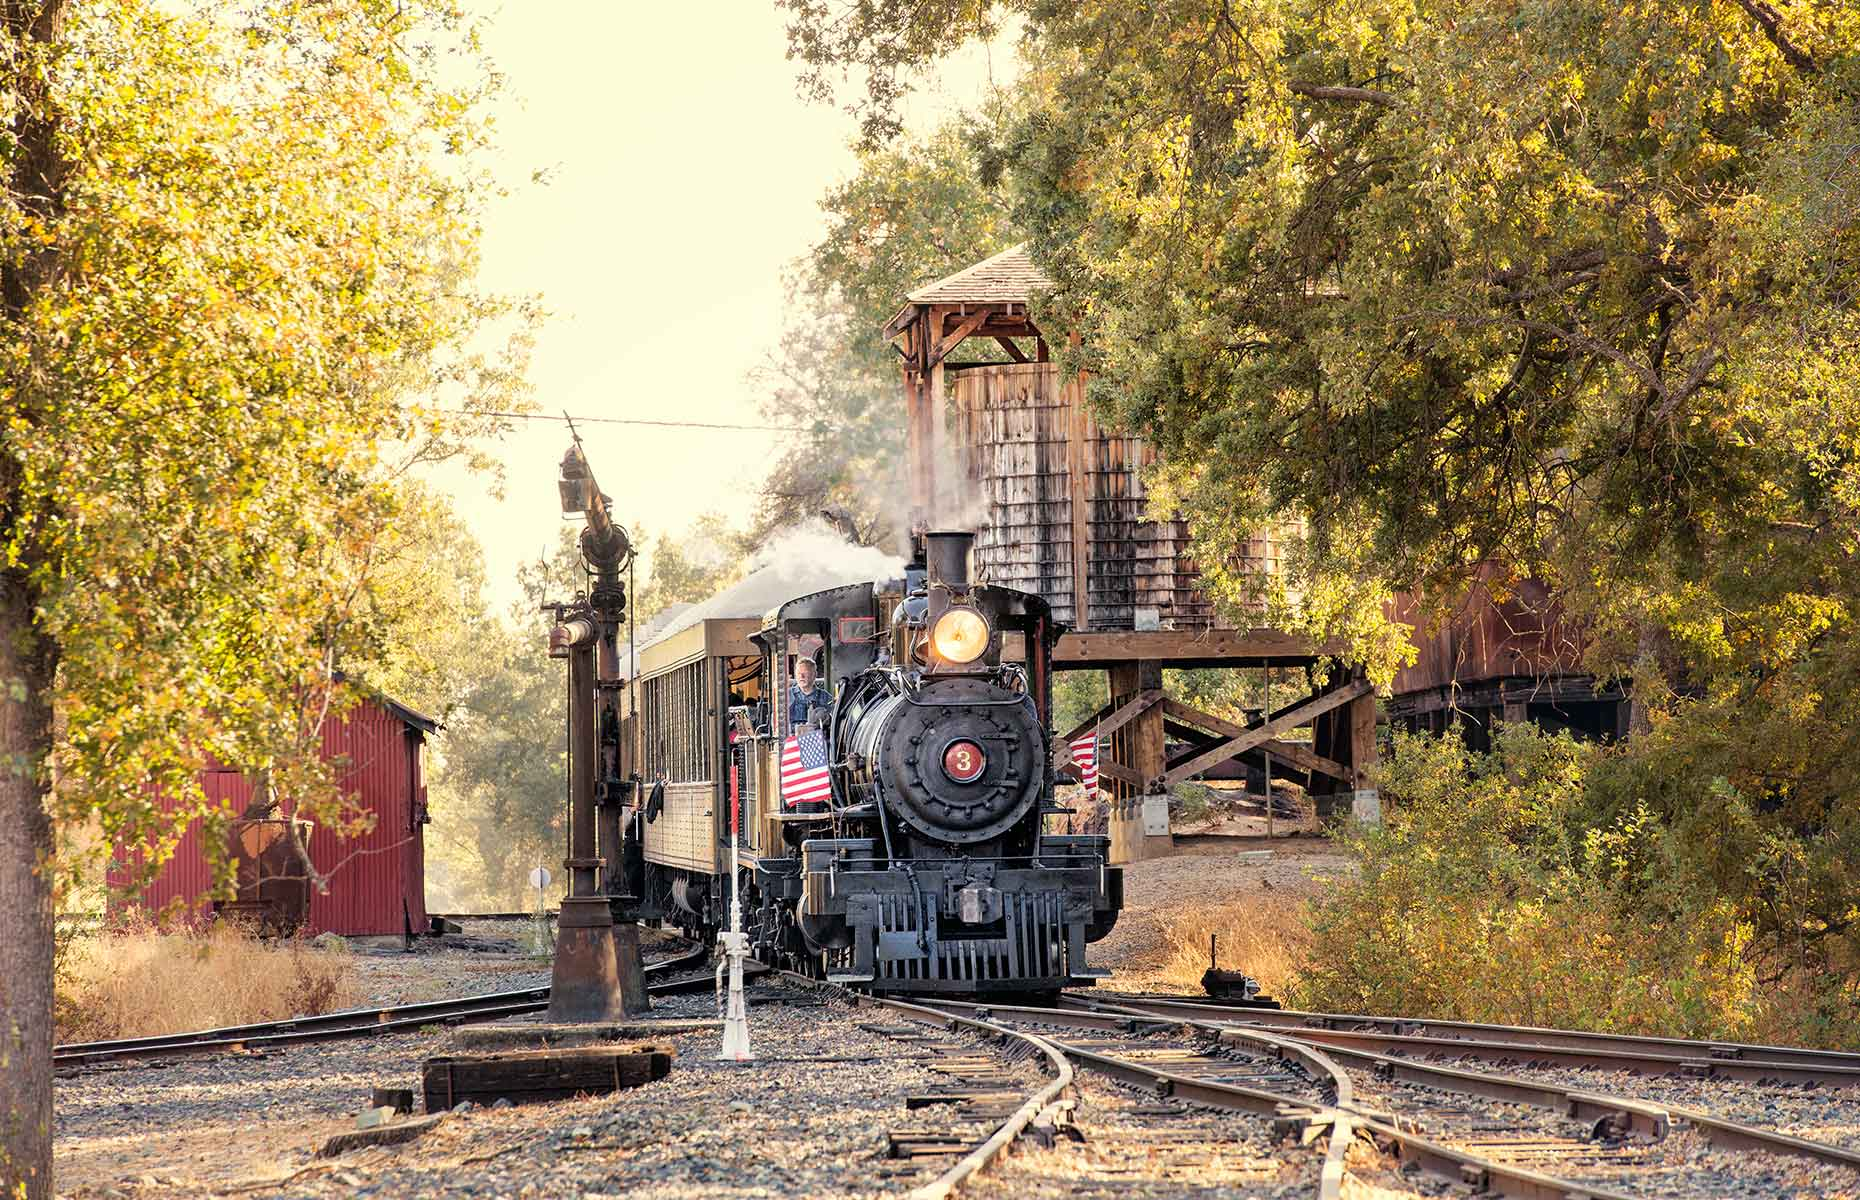 Sierra #3 Railroad at 1897 State Historic Park (Image: Menka Belgal)